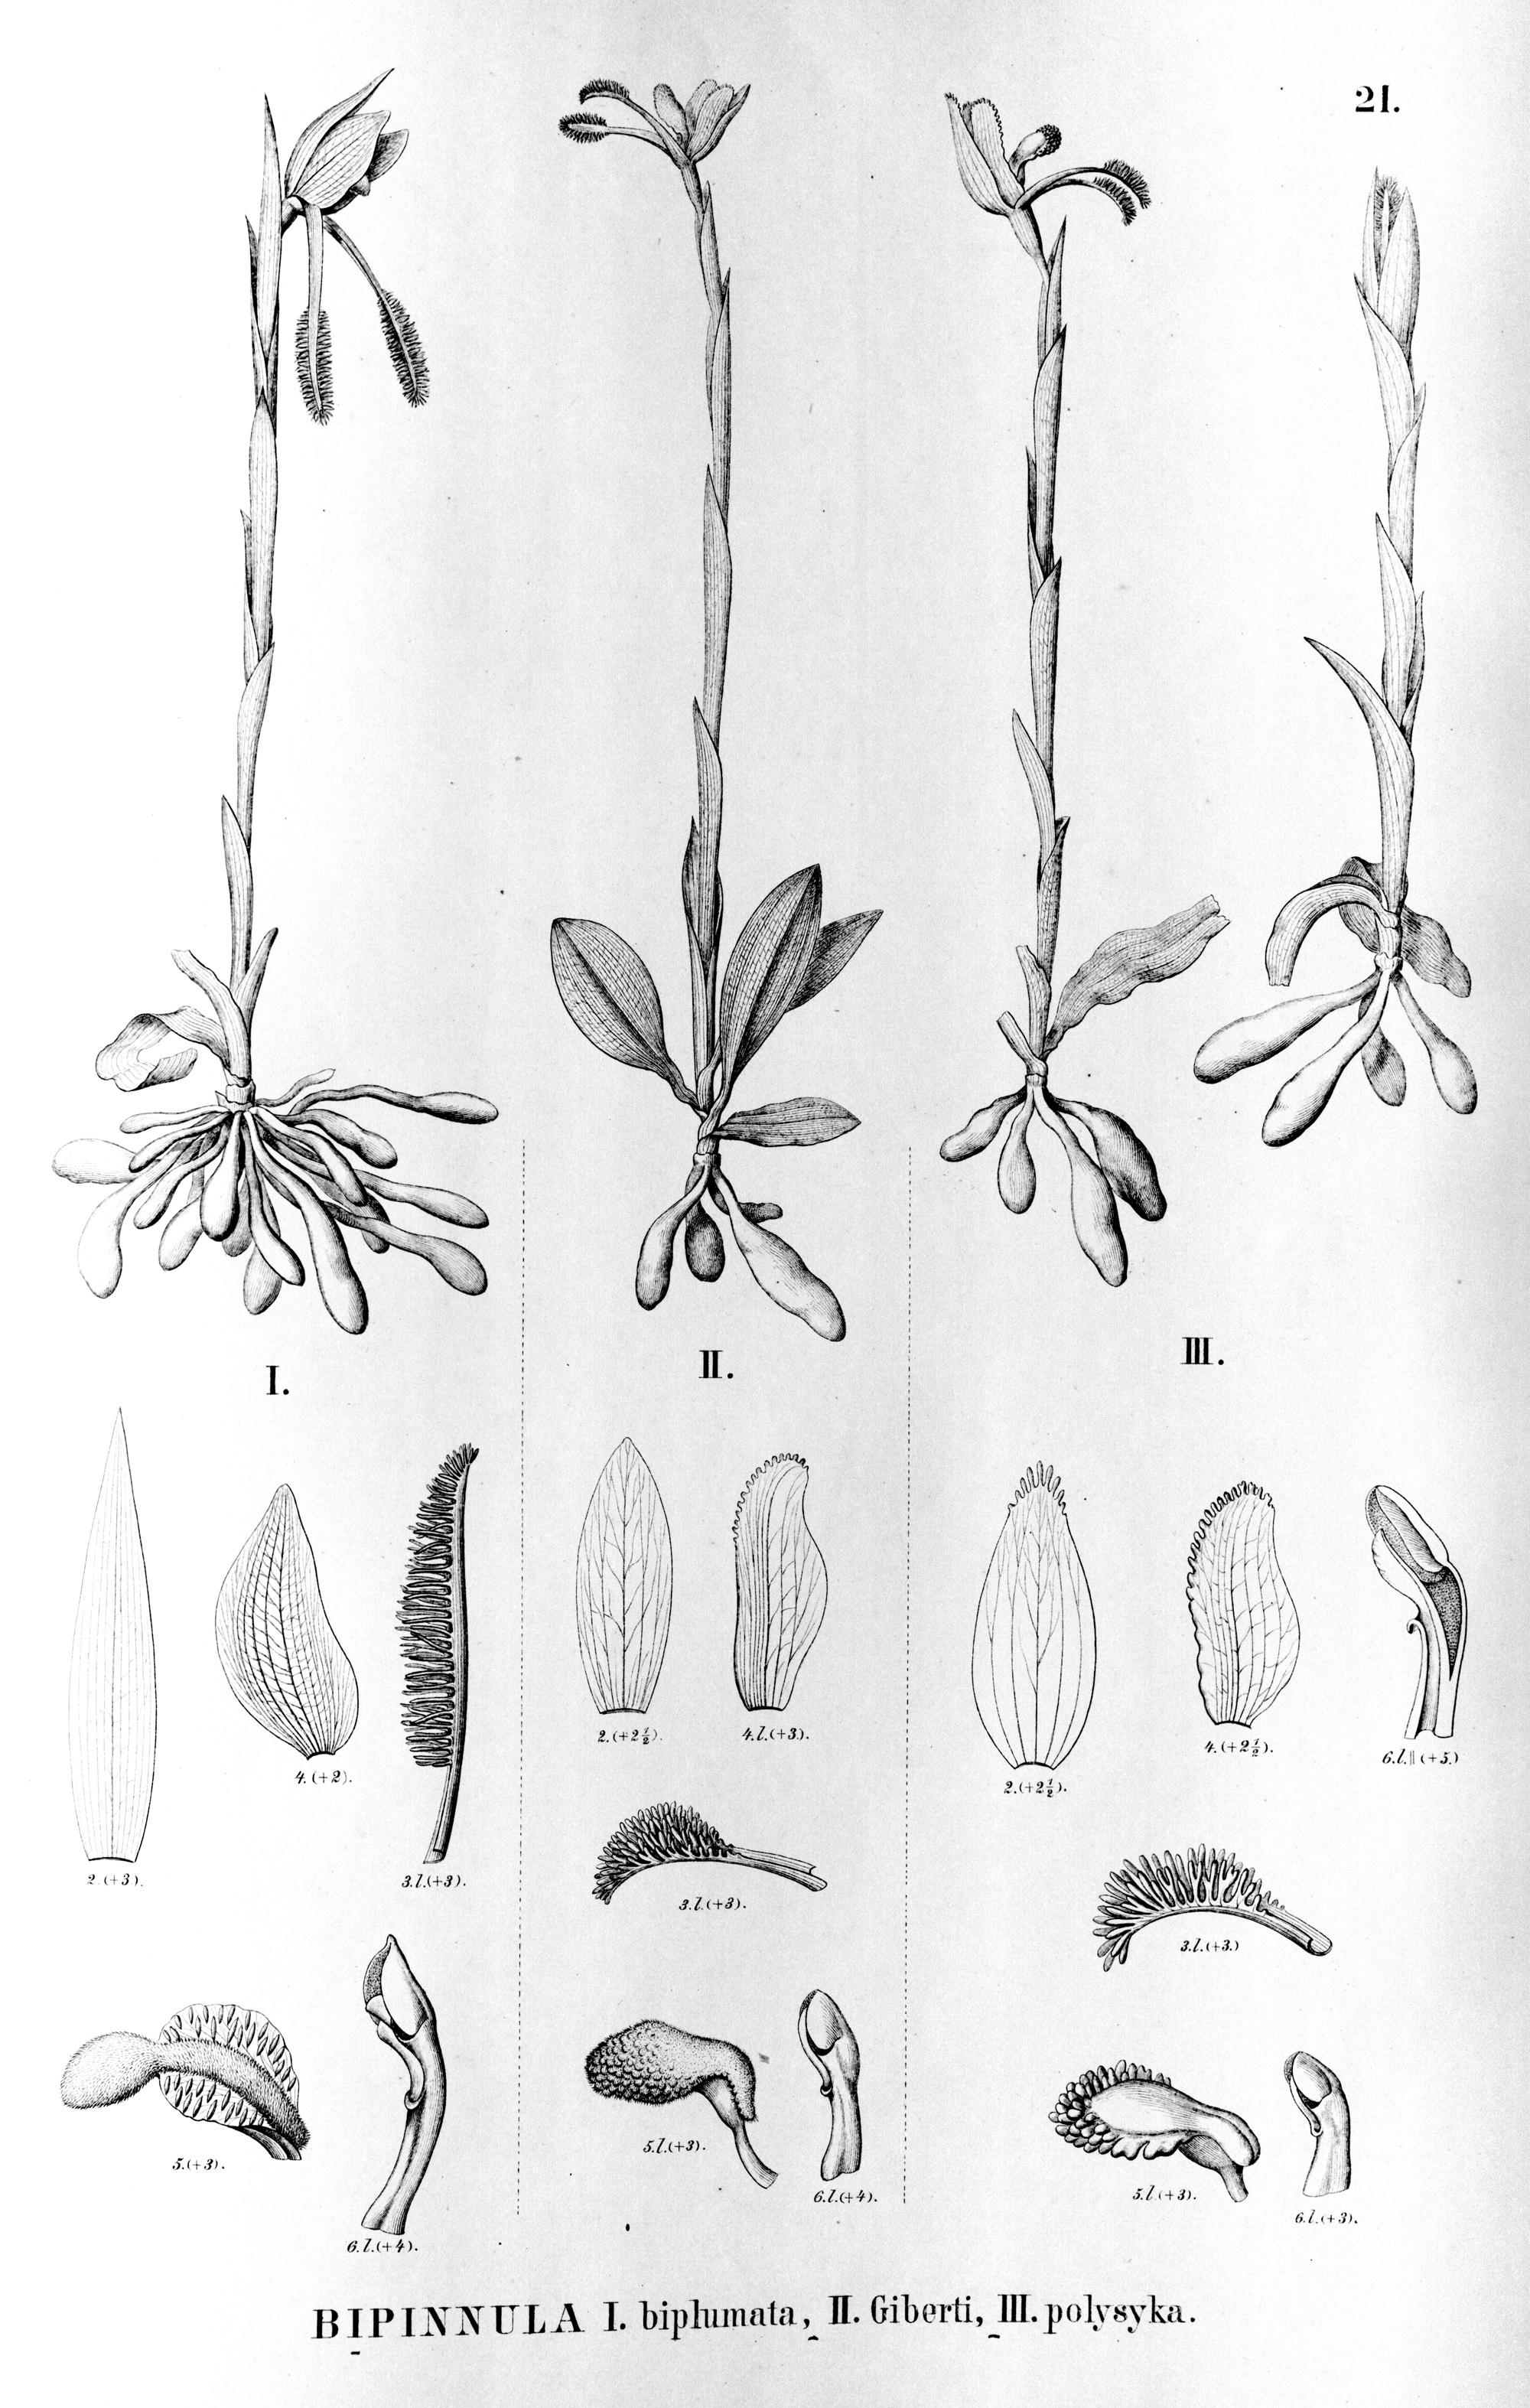 Image of Bipinnula